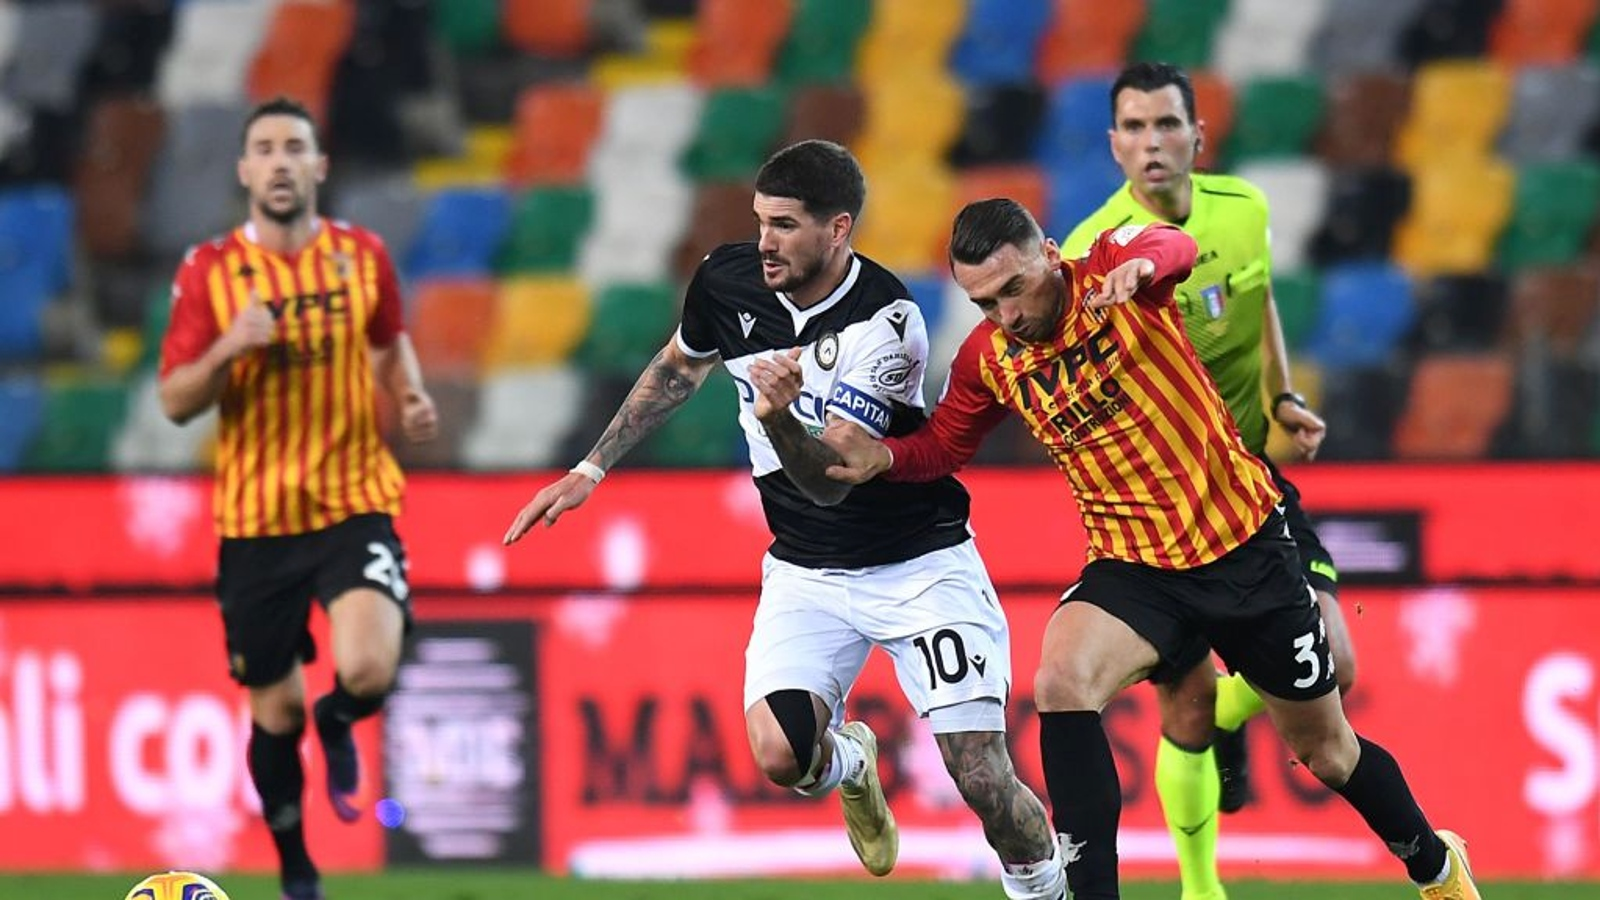 Udinese - Benevento 0-2 - Calcio - Rai Sport